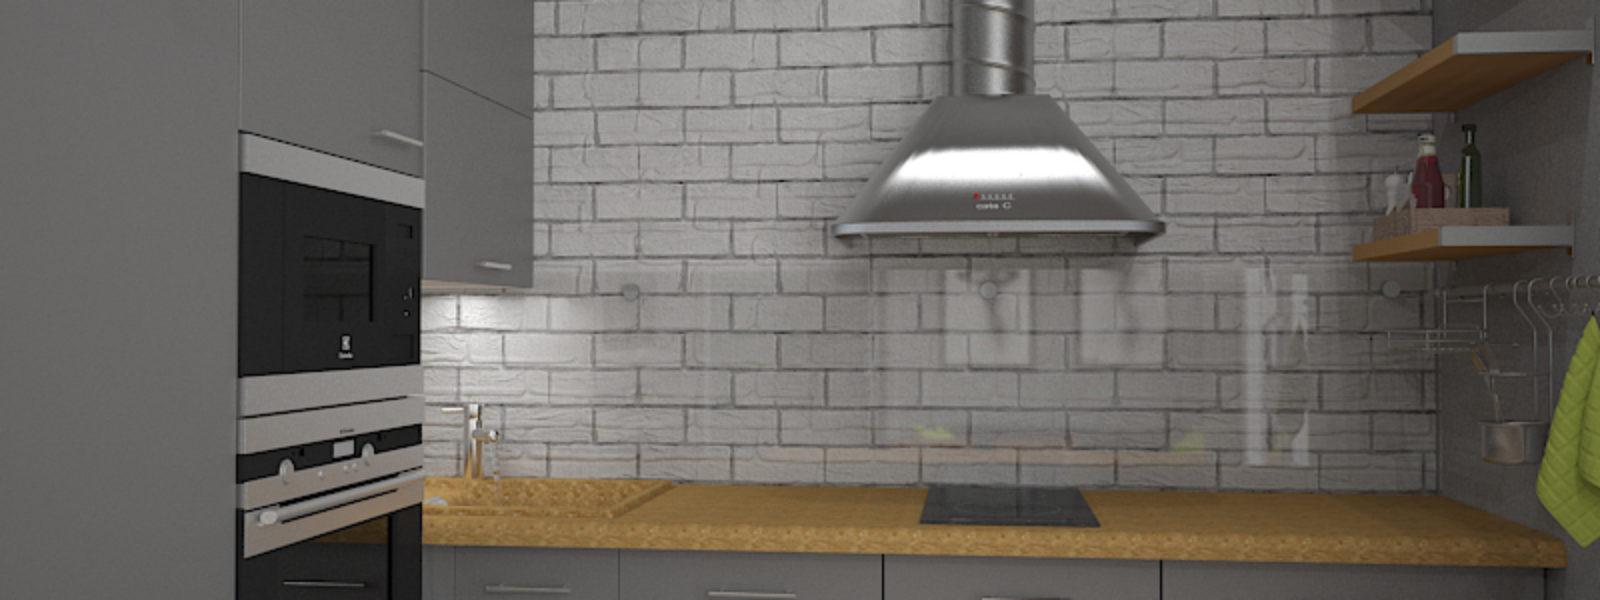 Дизайн проект квартиры в стиле лофт. Кухня.